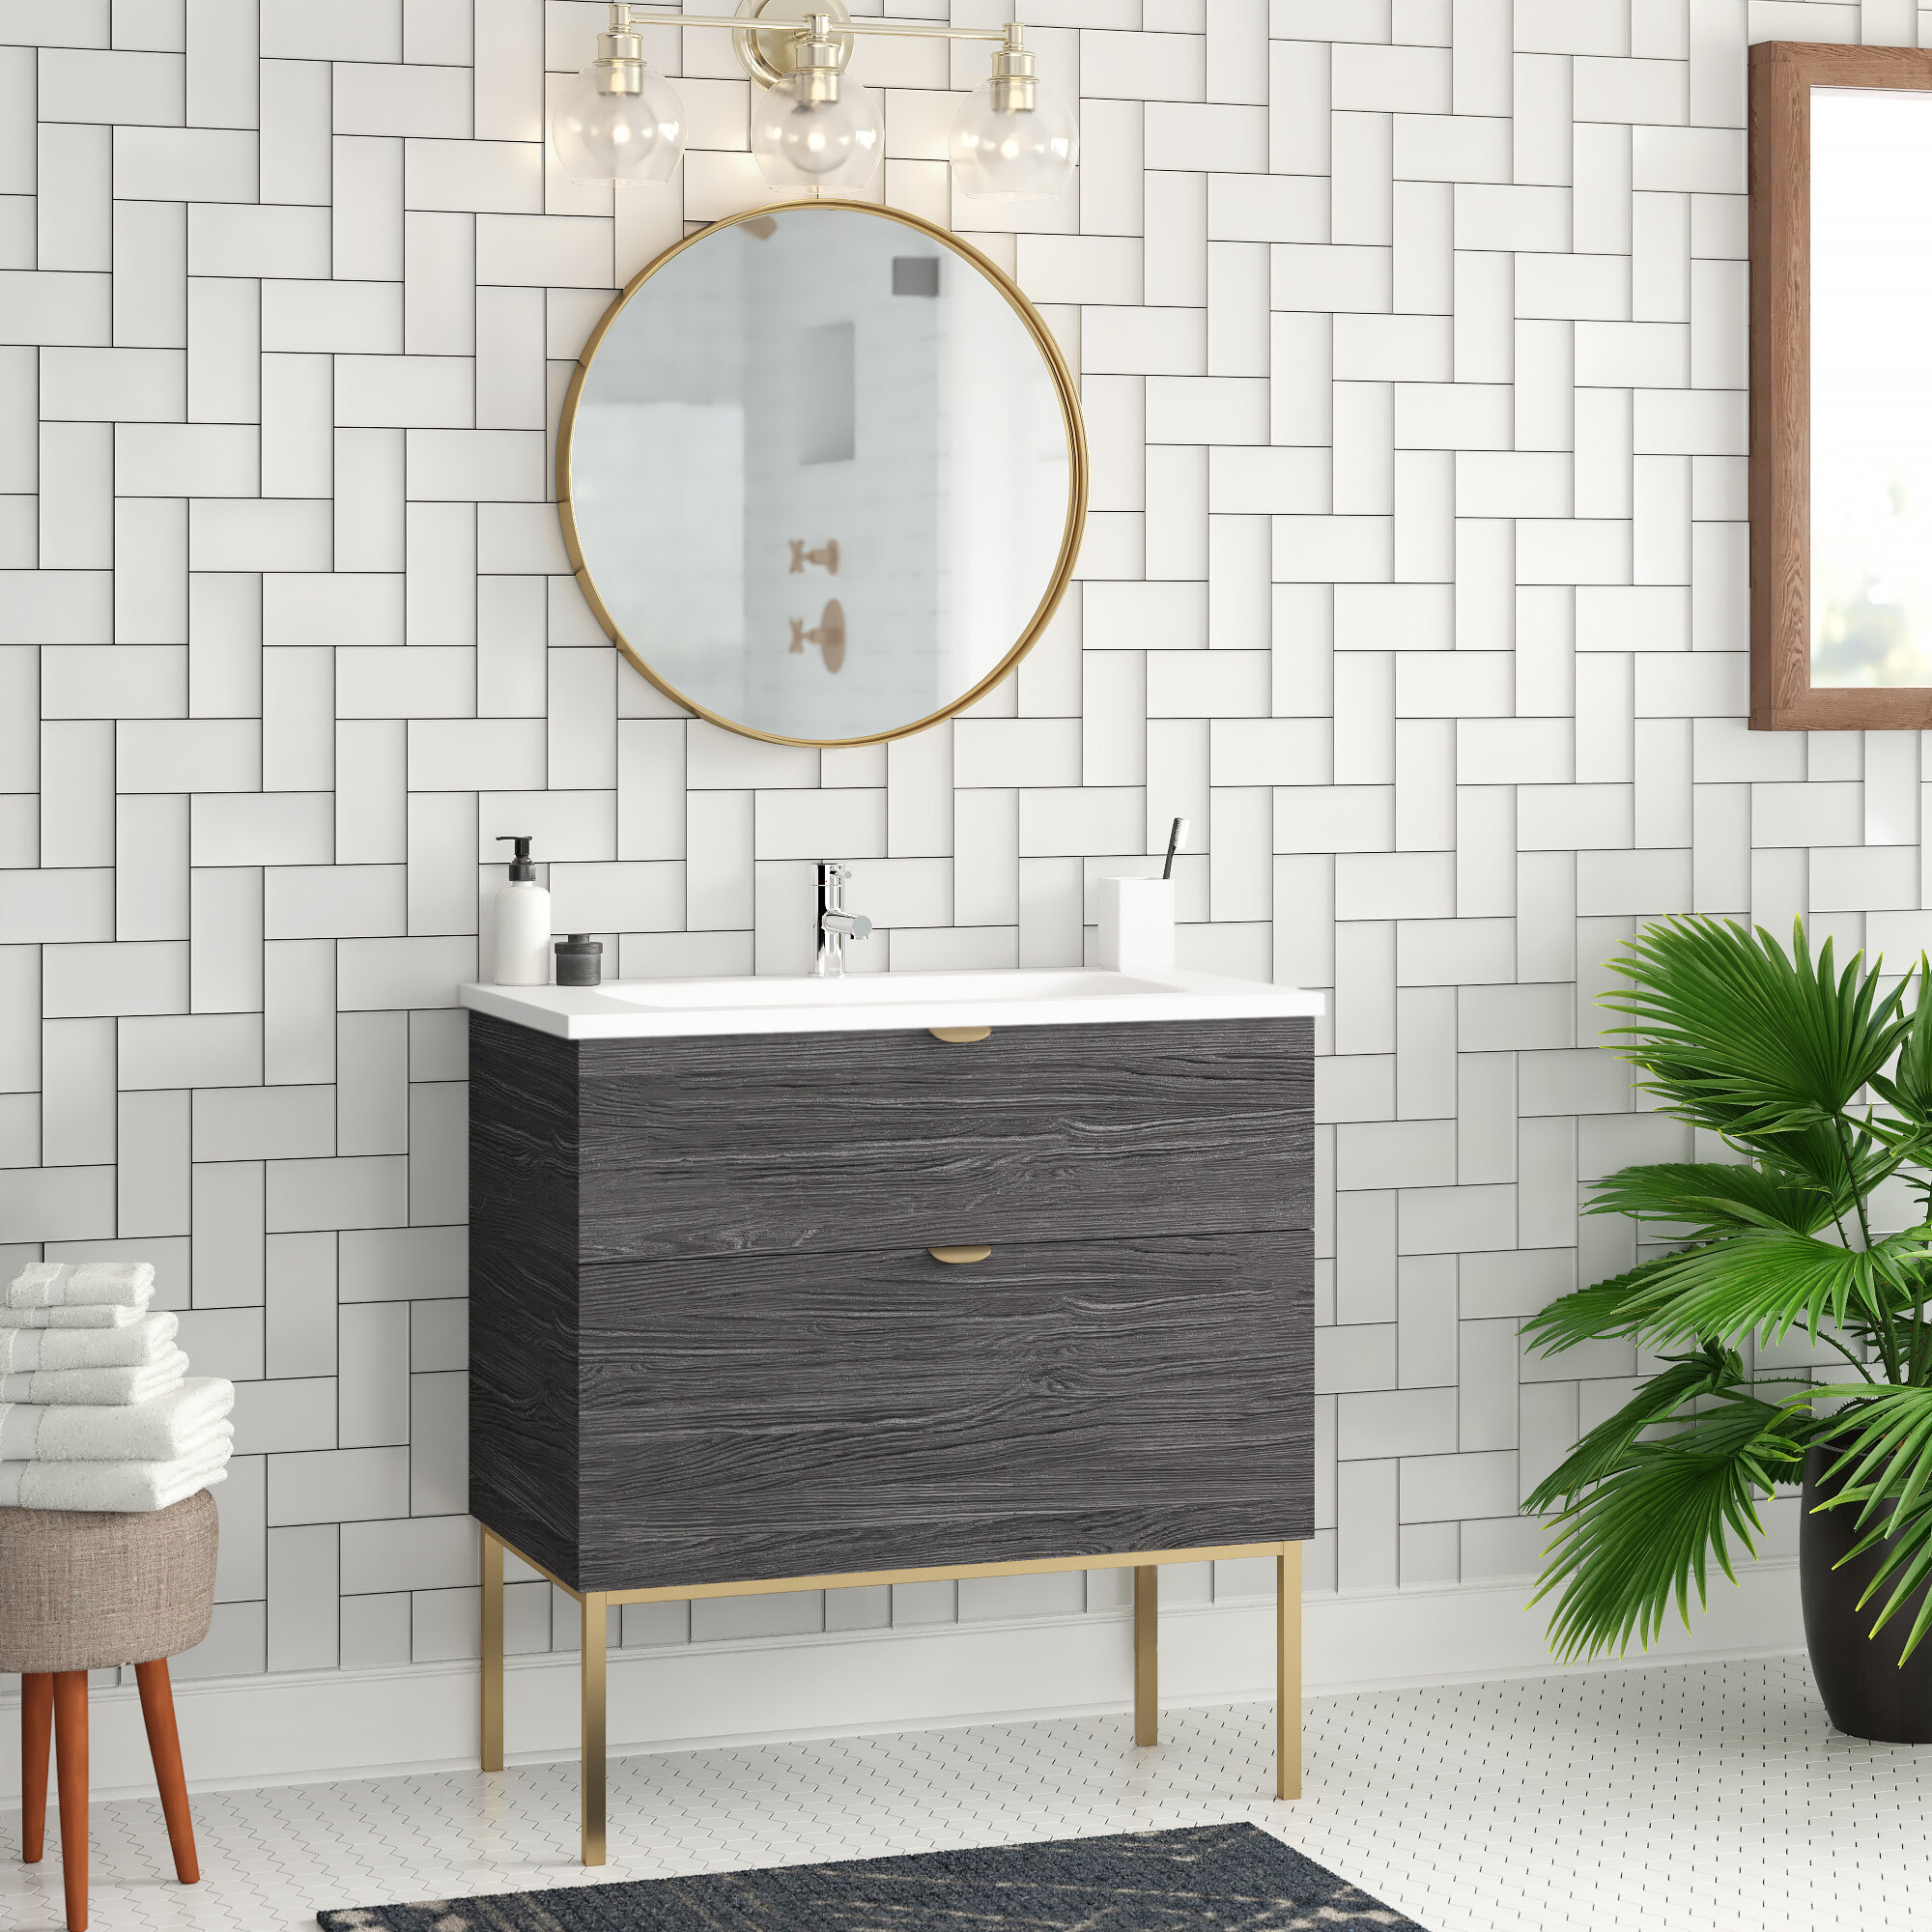 Wonline 24 Black Modern Bathroom Vanity With Shelf Adjustable Feet Vessel Sink Faucet Mirror Combo